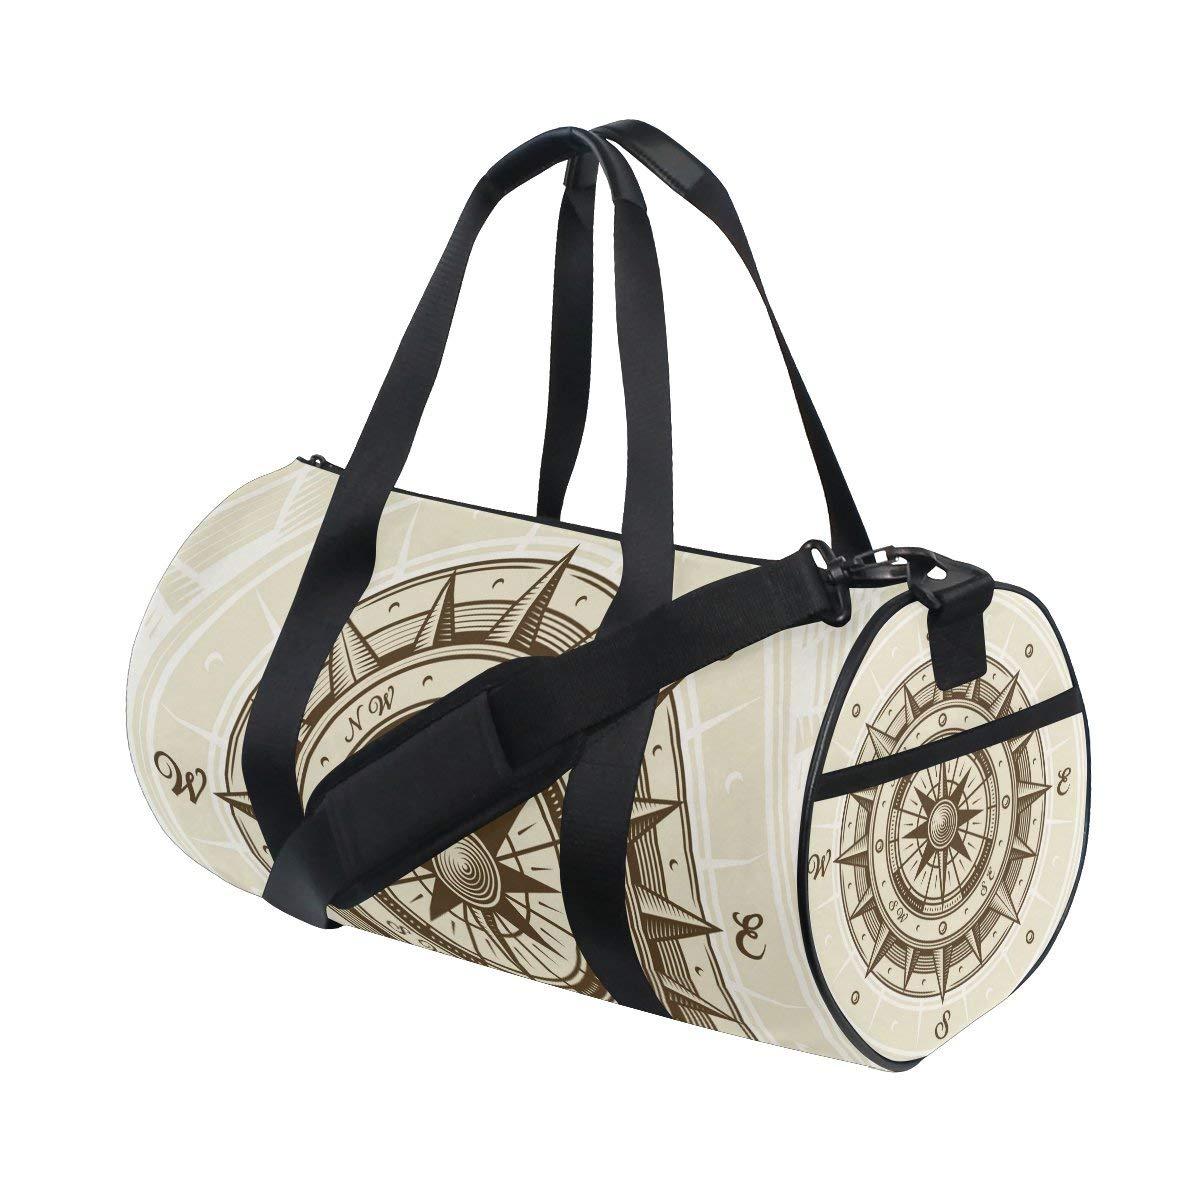 AHOMY Canvas Sports Gym Bag Mexican Pattern Print Vintage Travel Shoulder Bag